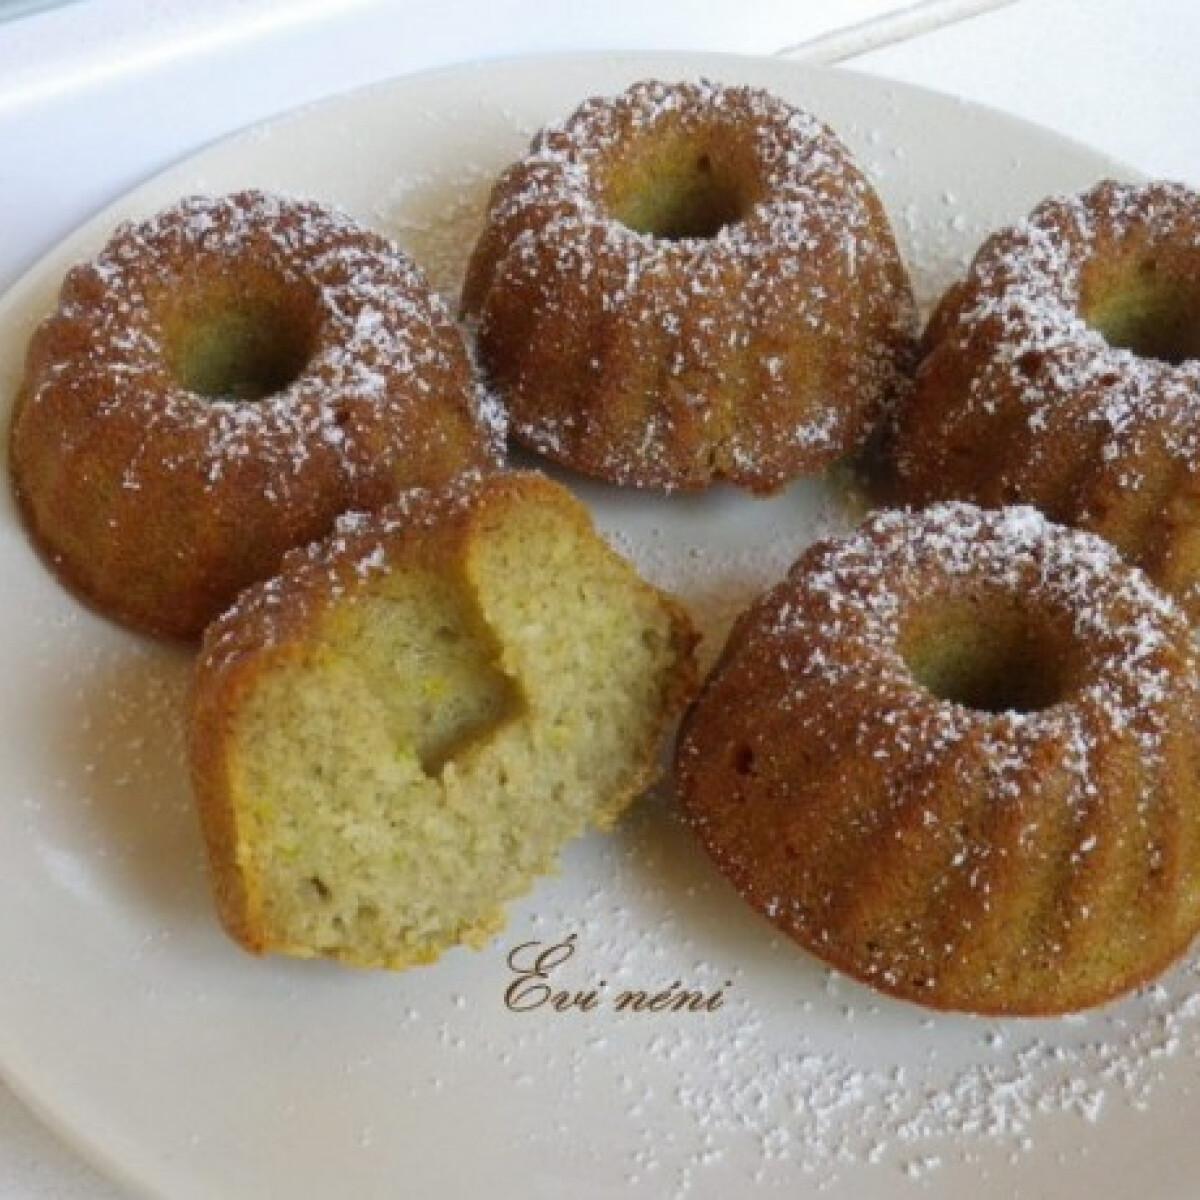 Ezen a képen: Gluténmentes banános muffin